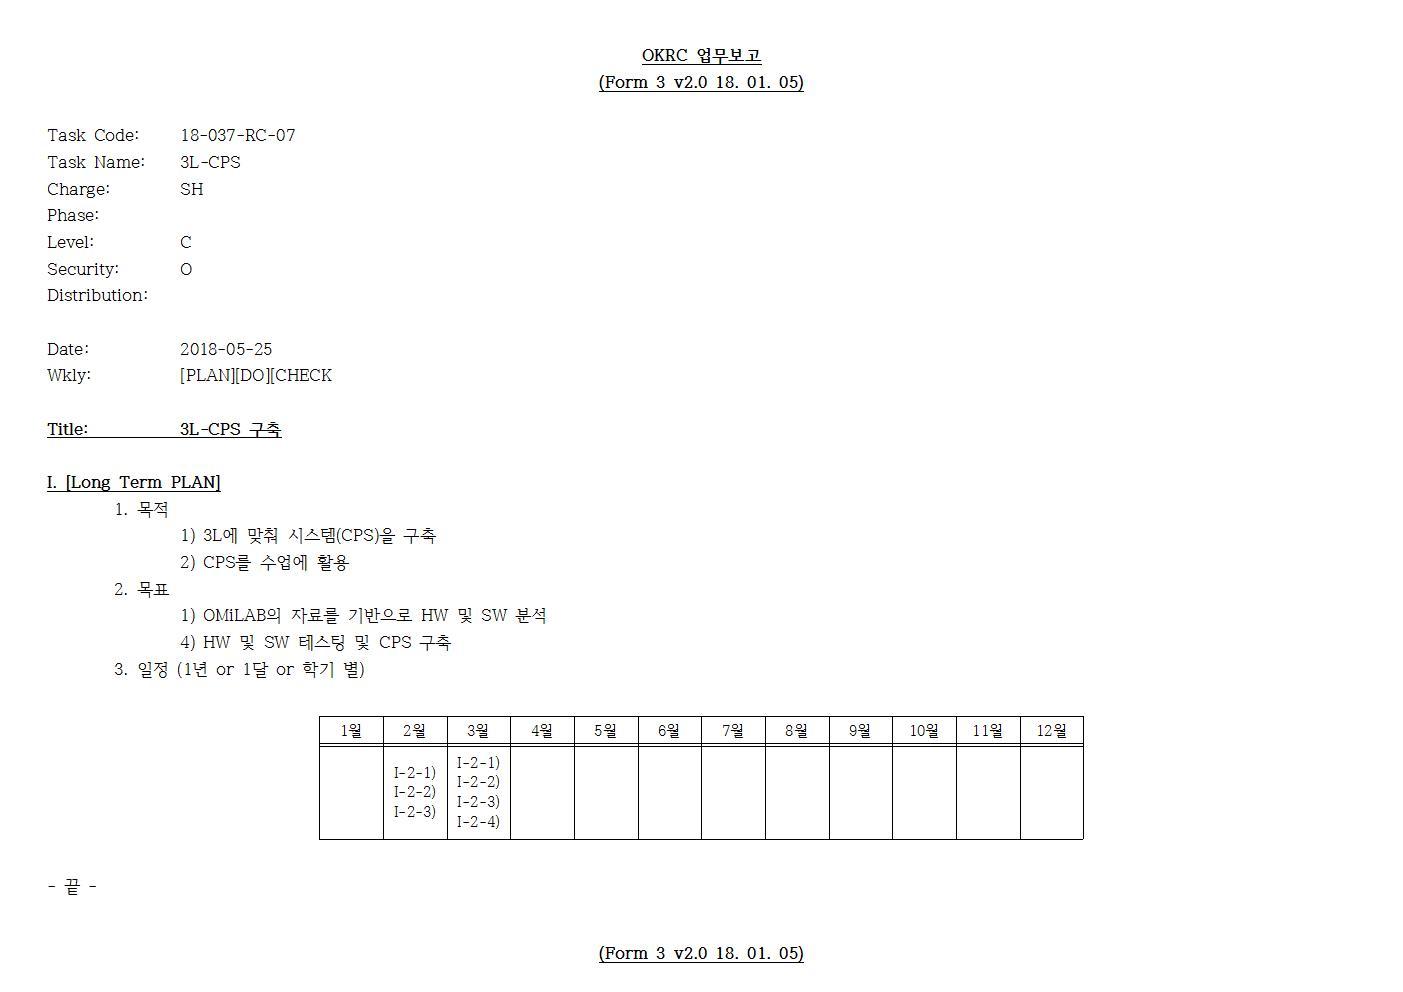 D-[18-037-RC-07]-[3L-CPS]-[2018-05-25][SH]001.jpg